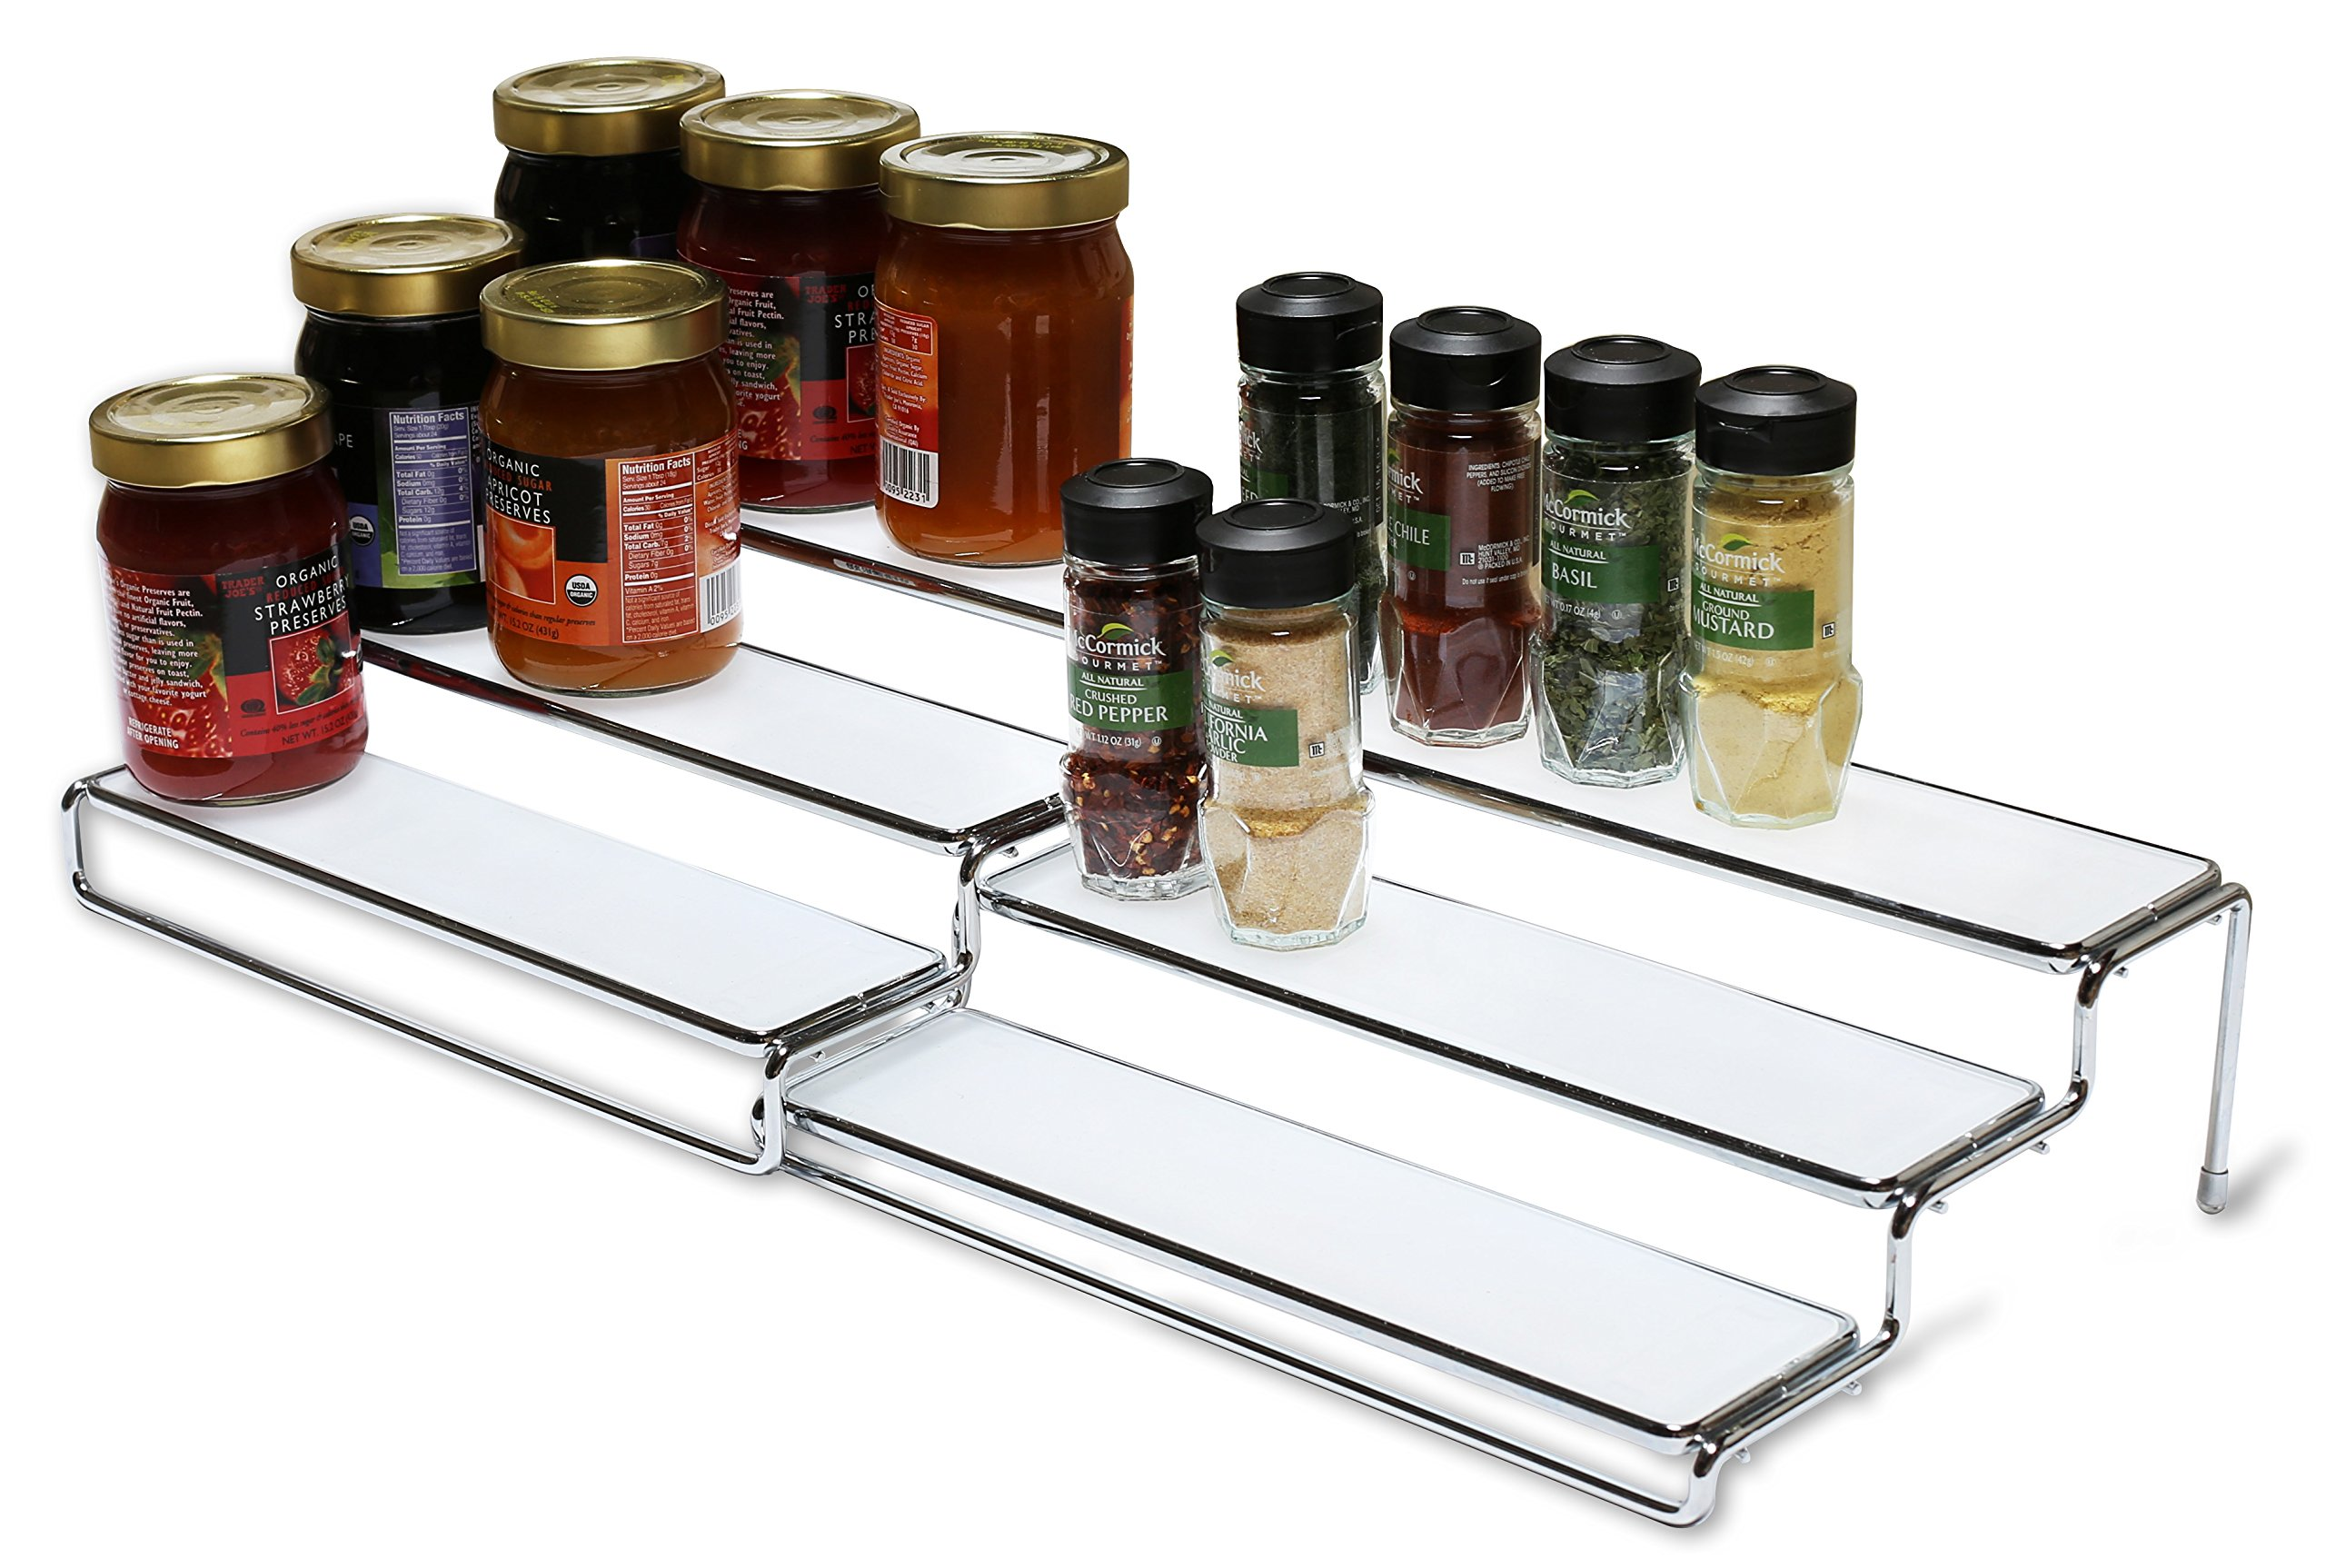 DecoBros 3 Tier Expandable Cabinet Spice Rack Step Shelf Organizer (12.5 ~ 25 Inch), Chrome by DecoBros